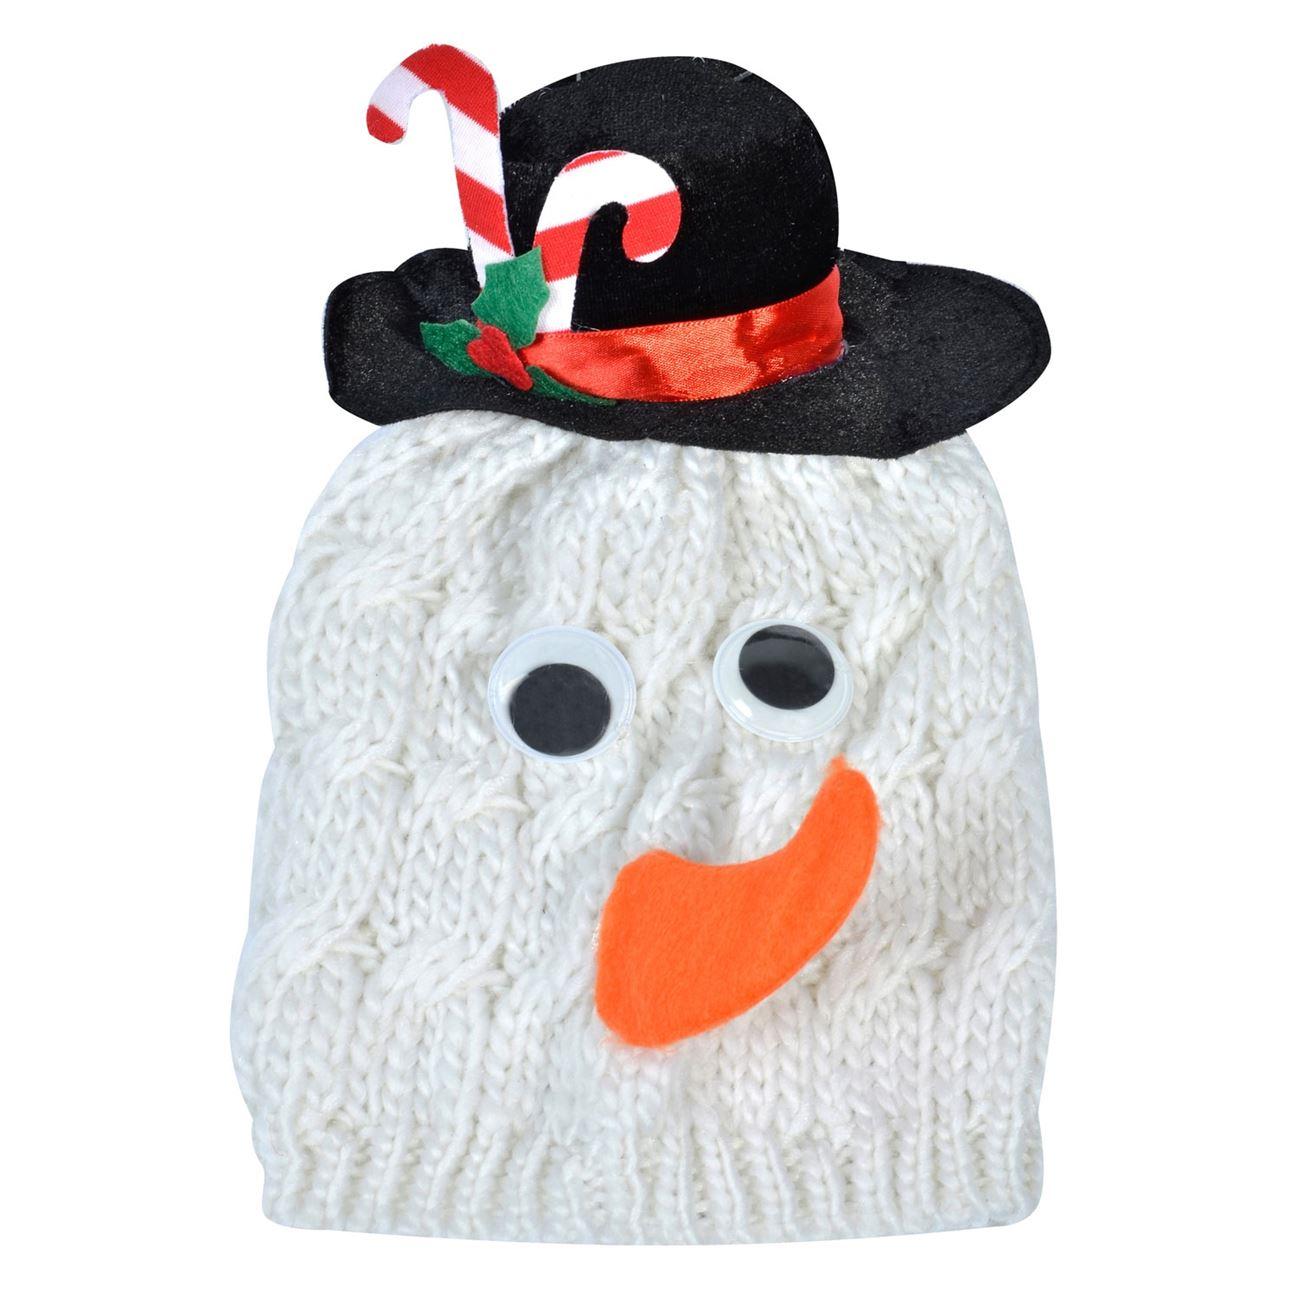 8f127bc5909 Χριστουγεννιάτικο Πλεκτό Σκουφί Χιονάνθρωπος